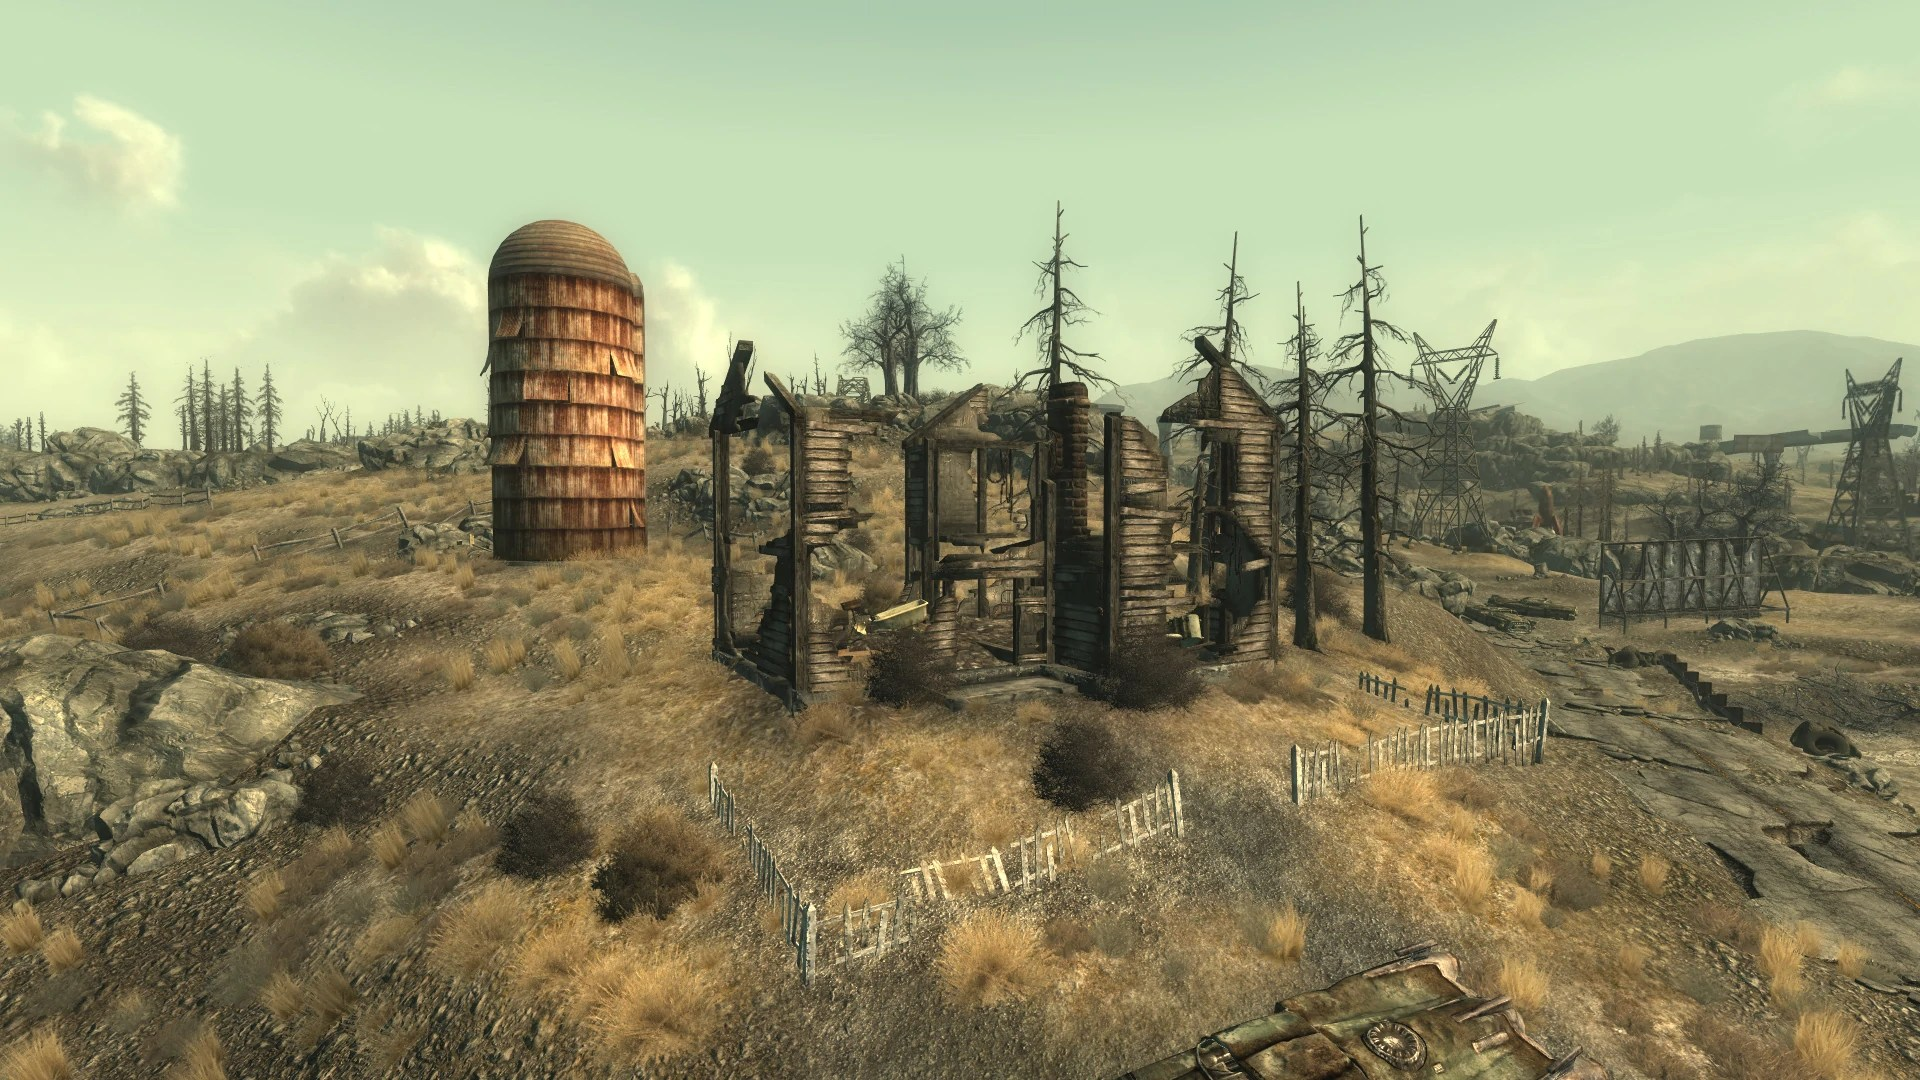 Ruined Farmhouse Fallout Wiki FANDOM Powered By Wikia